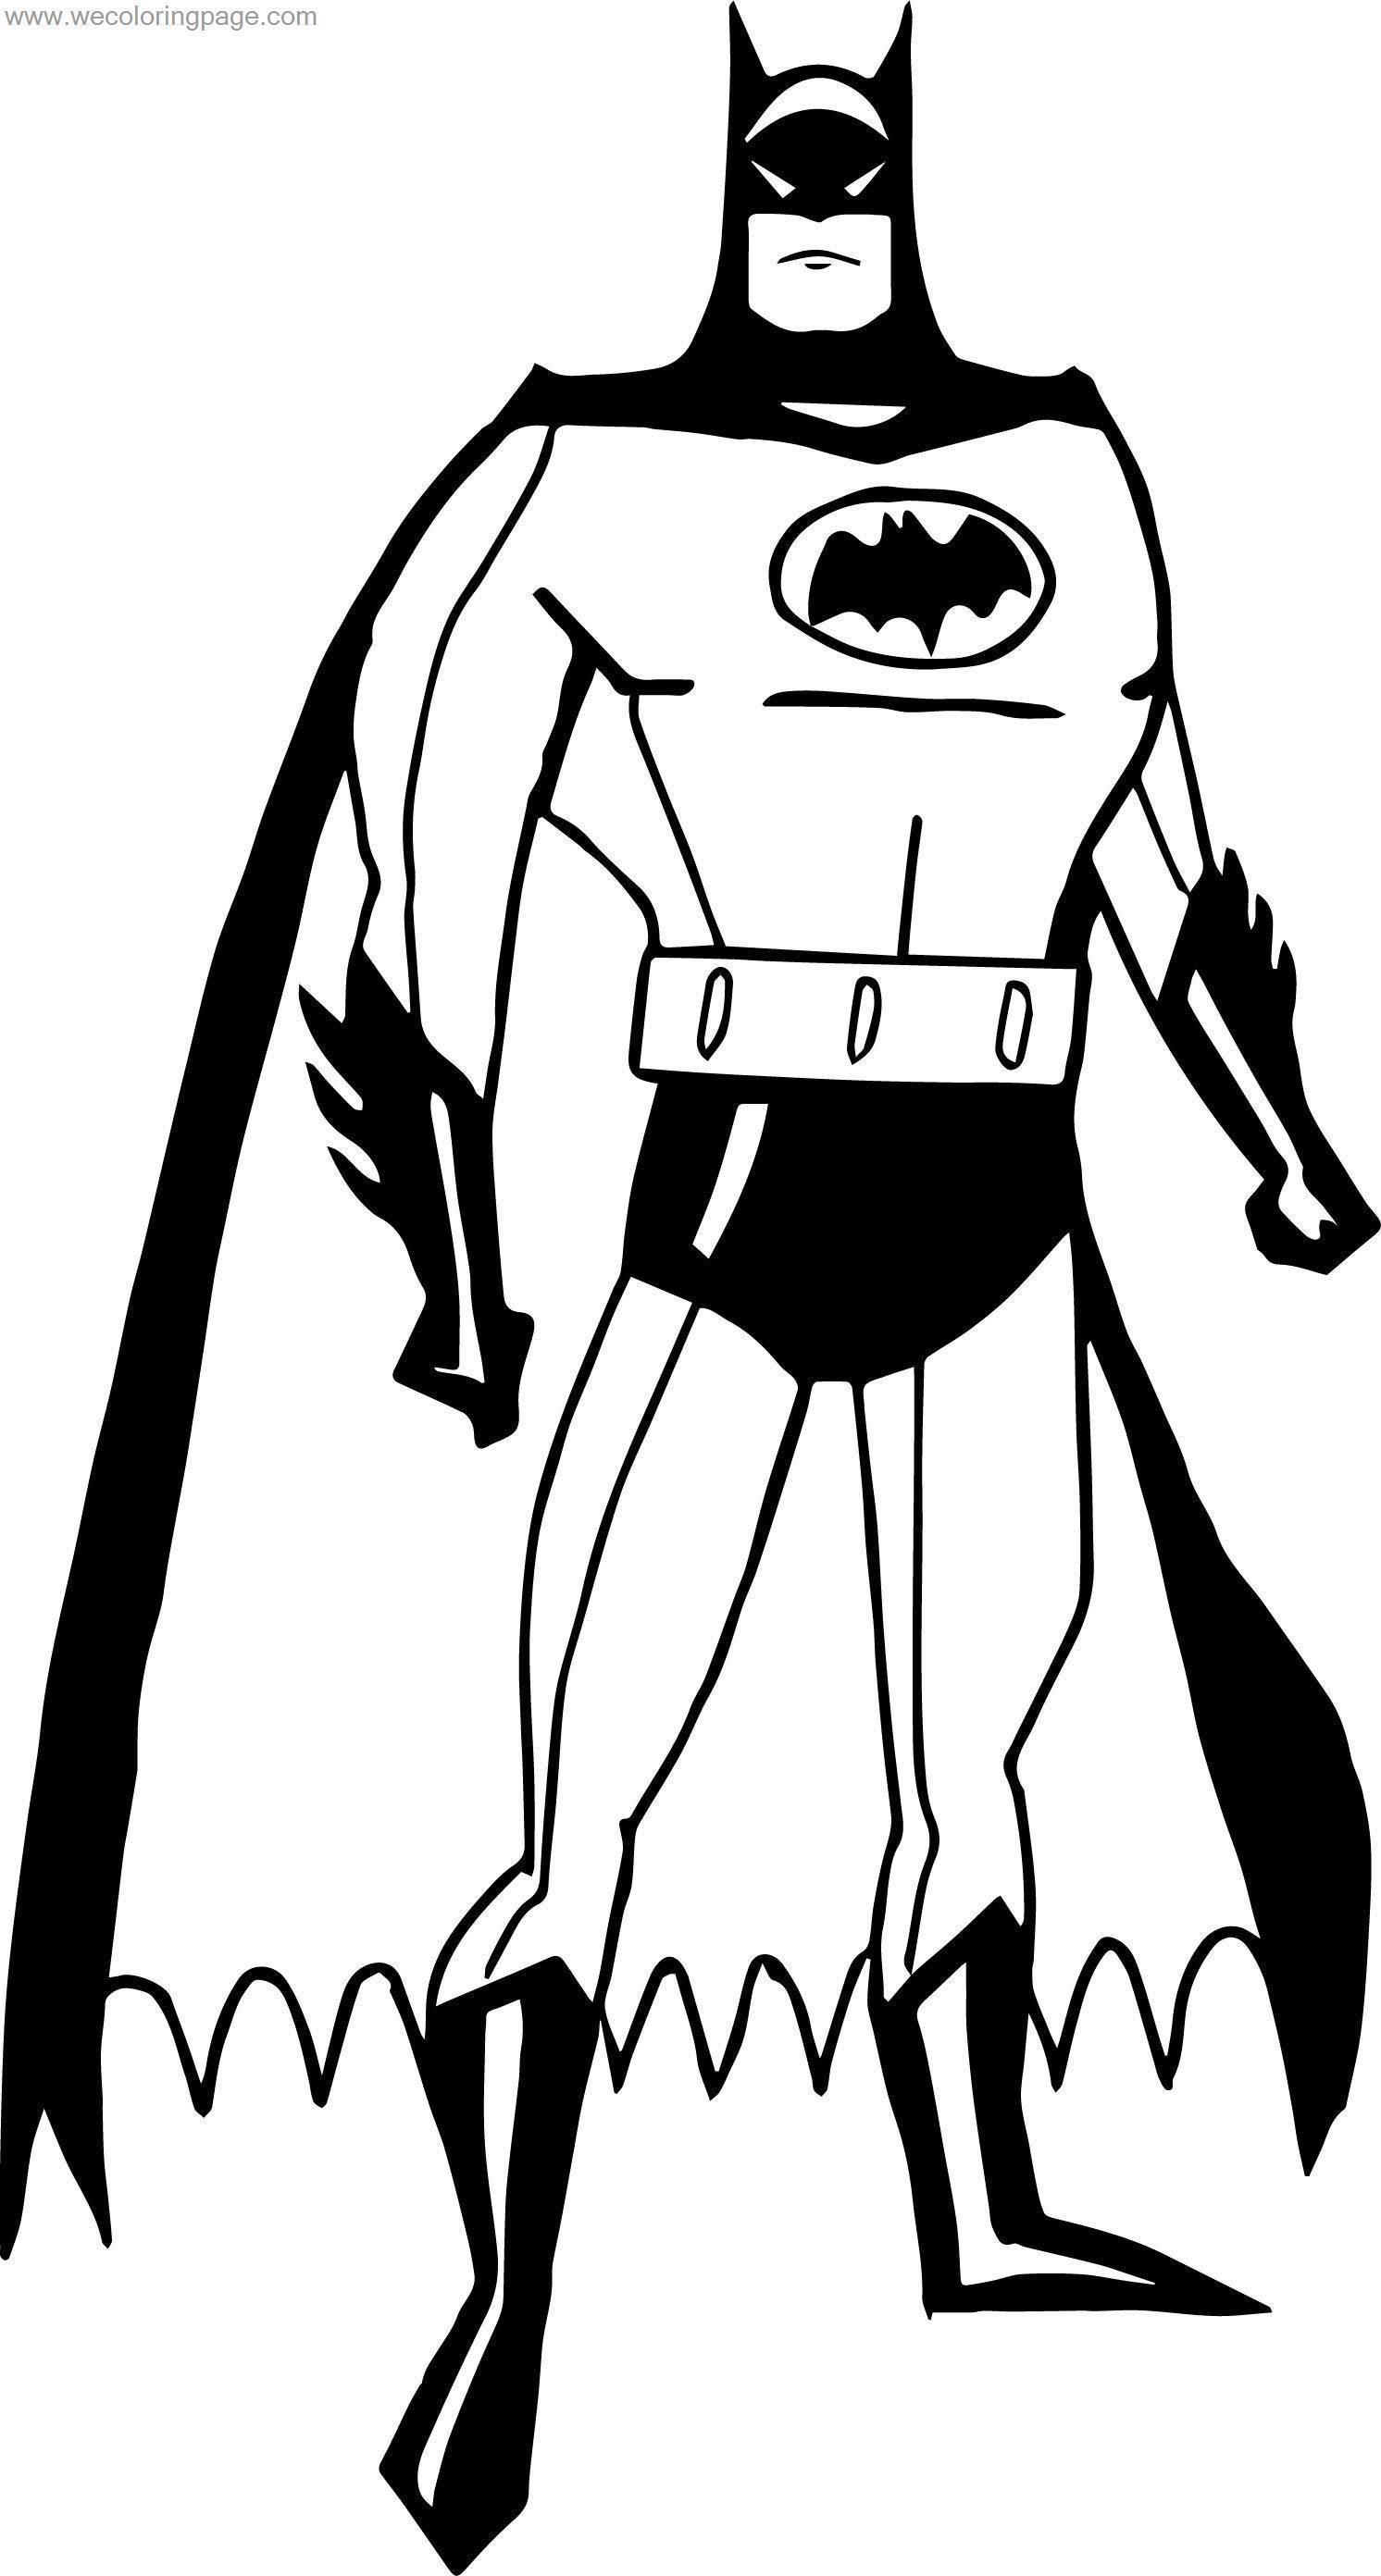 When Batman Coloring Page | Wecoloringpage.com